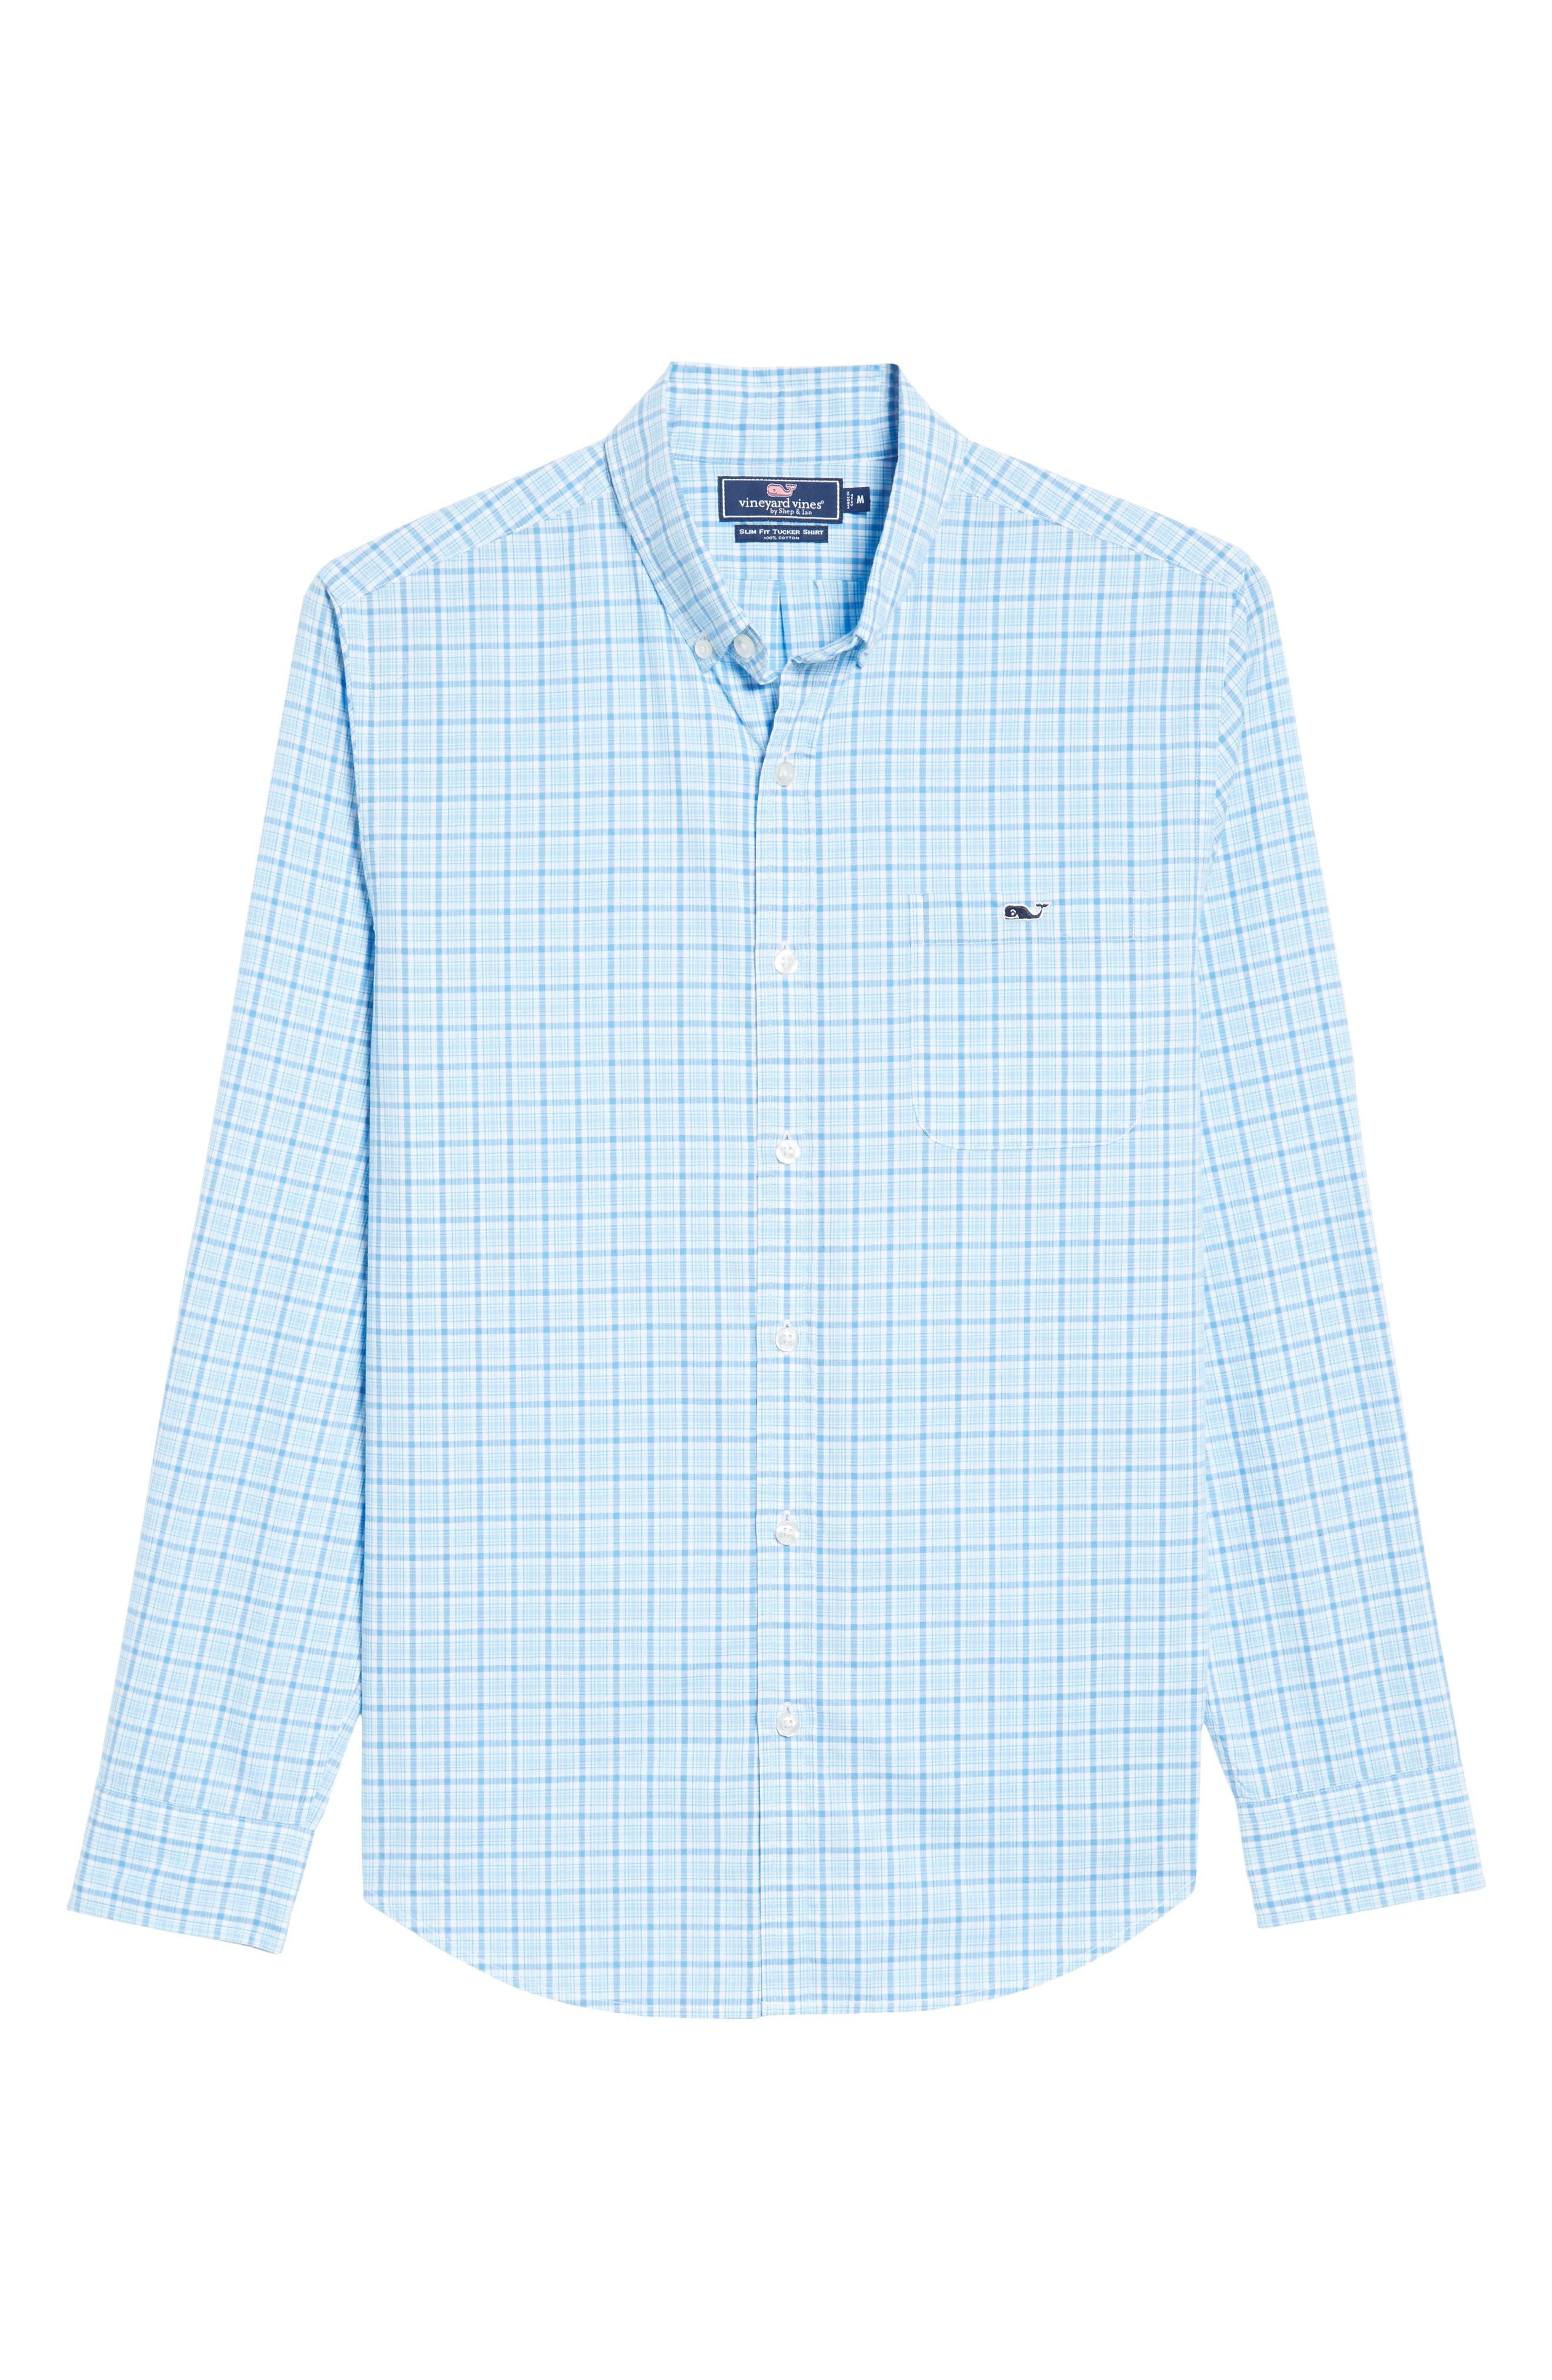 Seawatch Slim Fit Plaid Sport Shirt,                             Alternate thumbnail 6, color,                             459